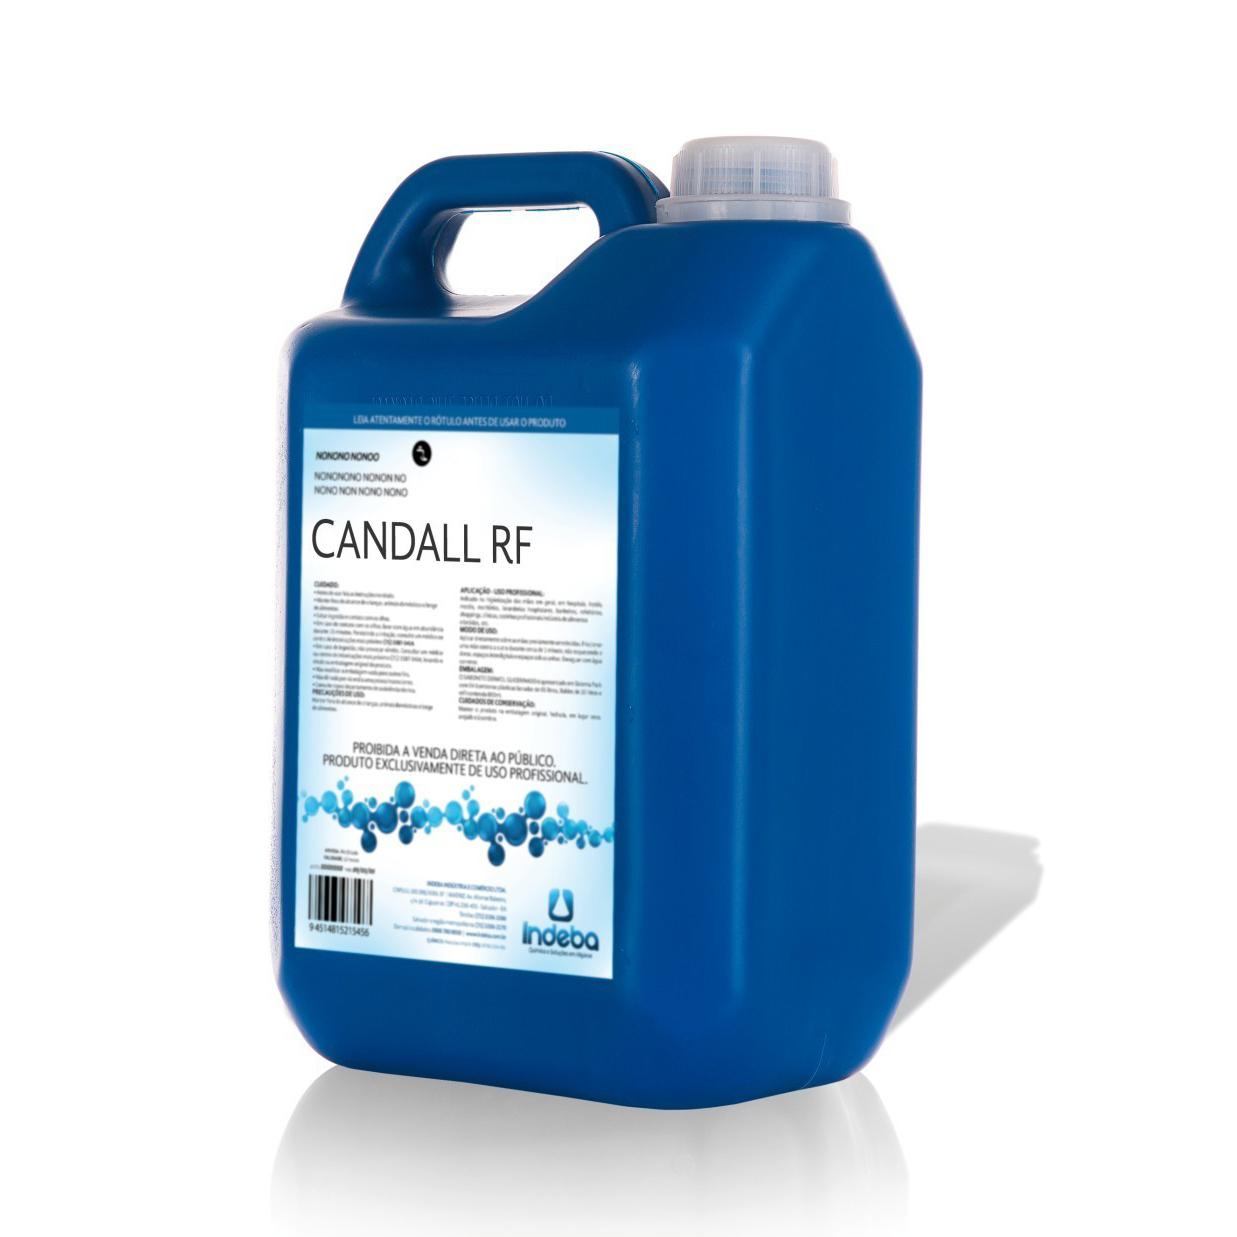 Candall RF